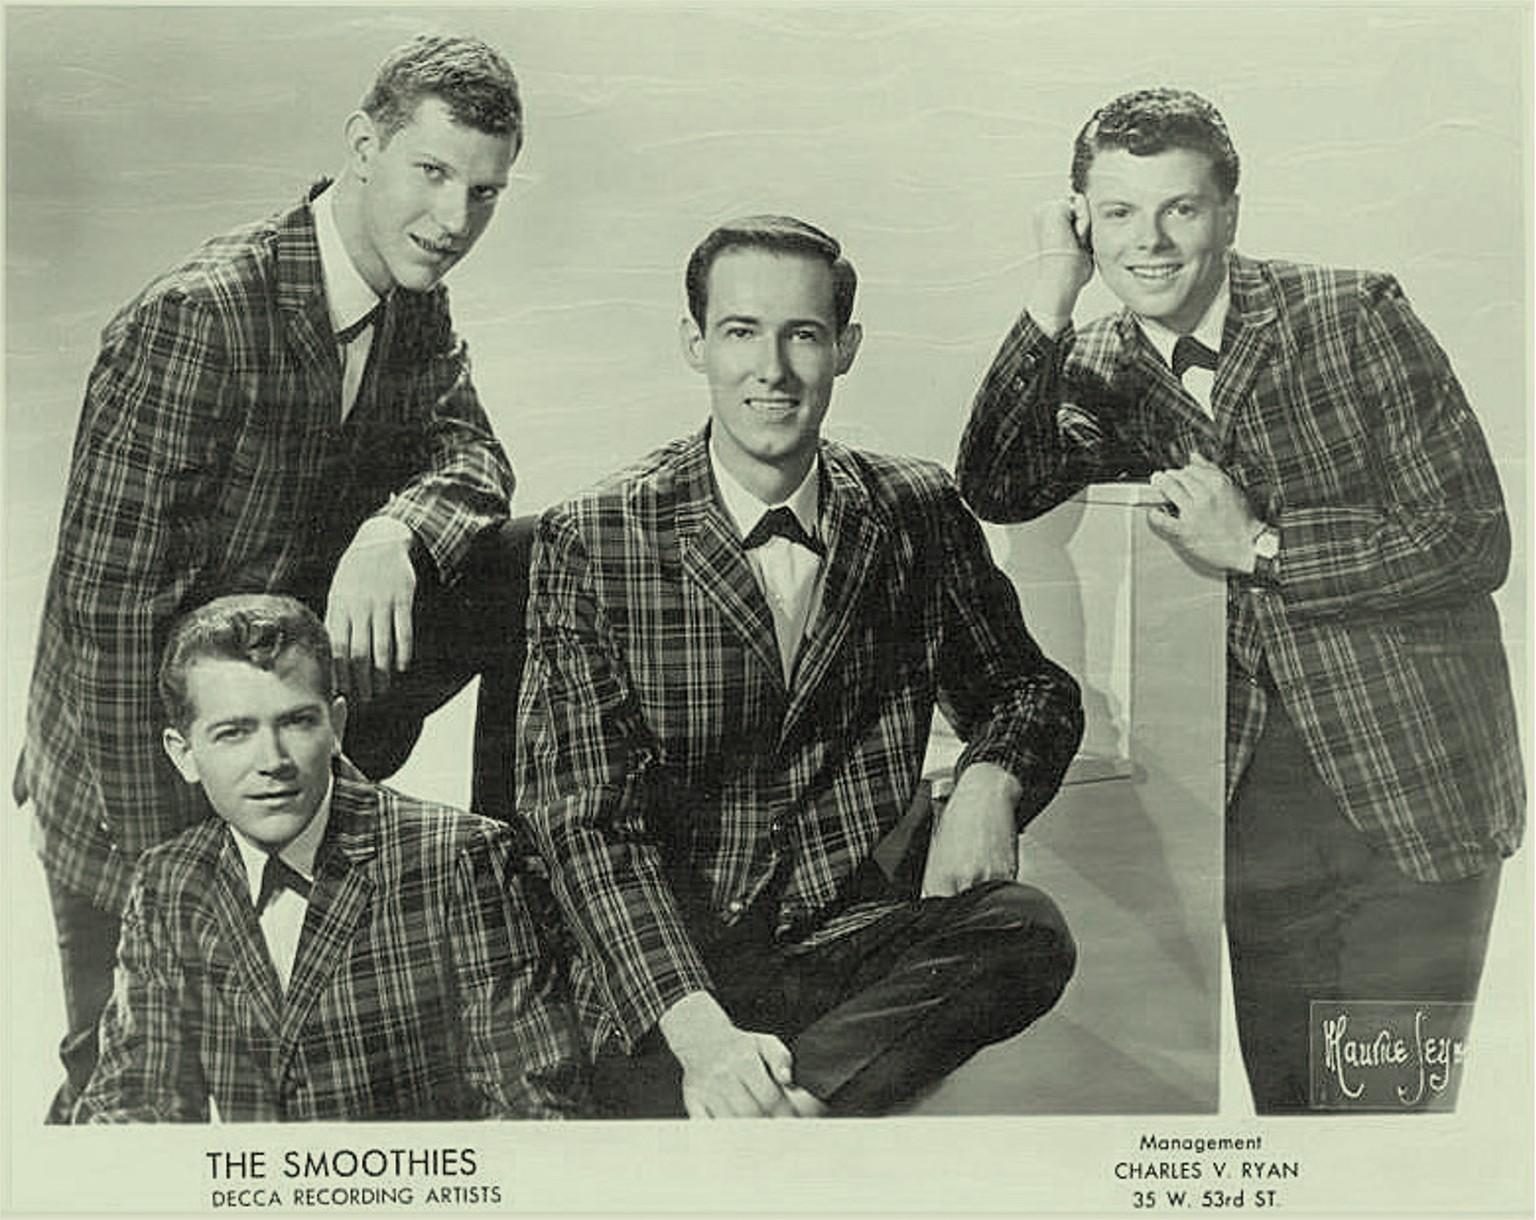 The Smoothies photo